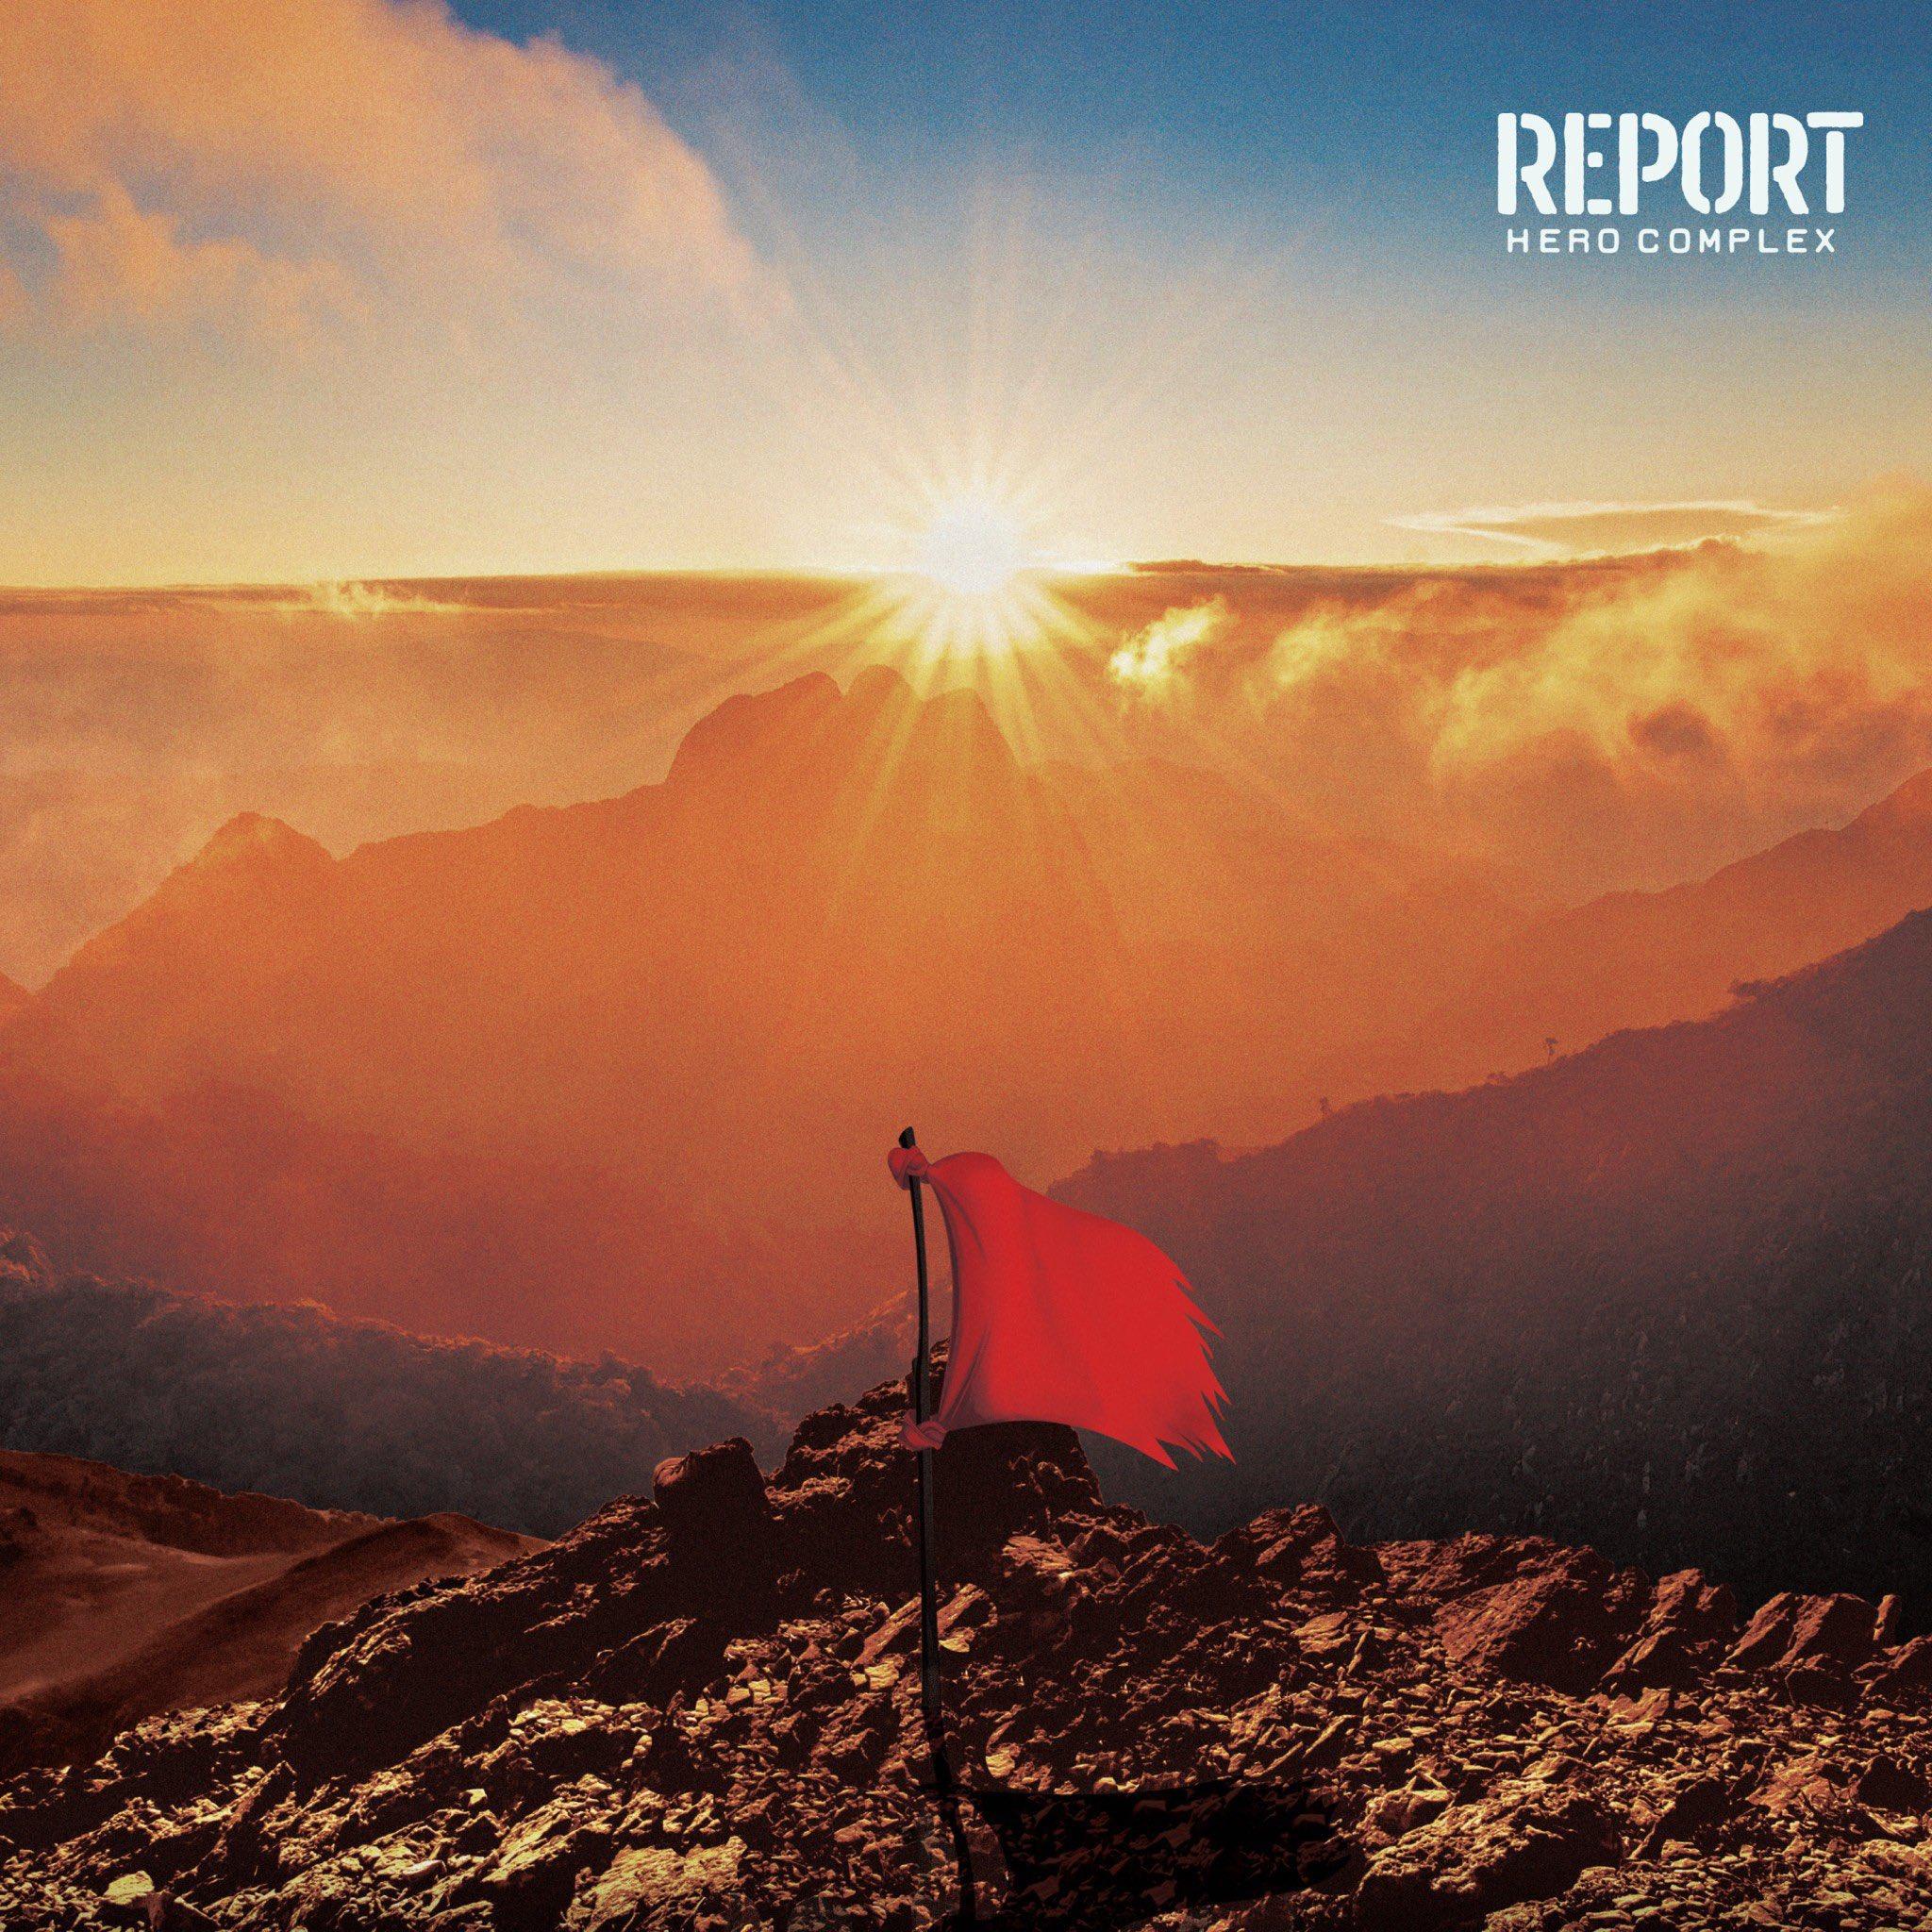 HERO COMPLEX 「REPORT」ジャケデザイン